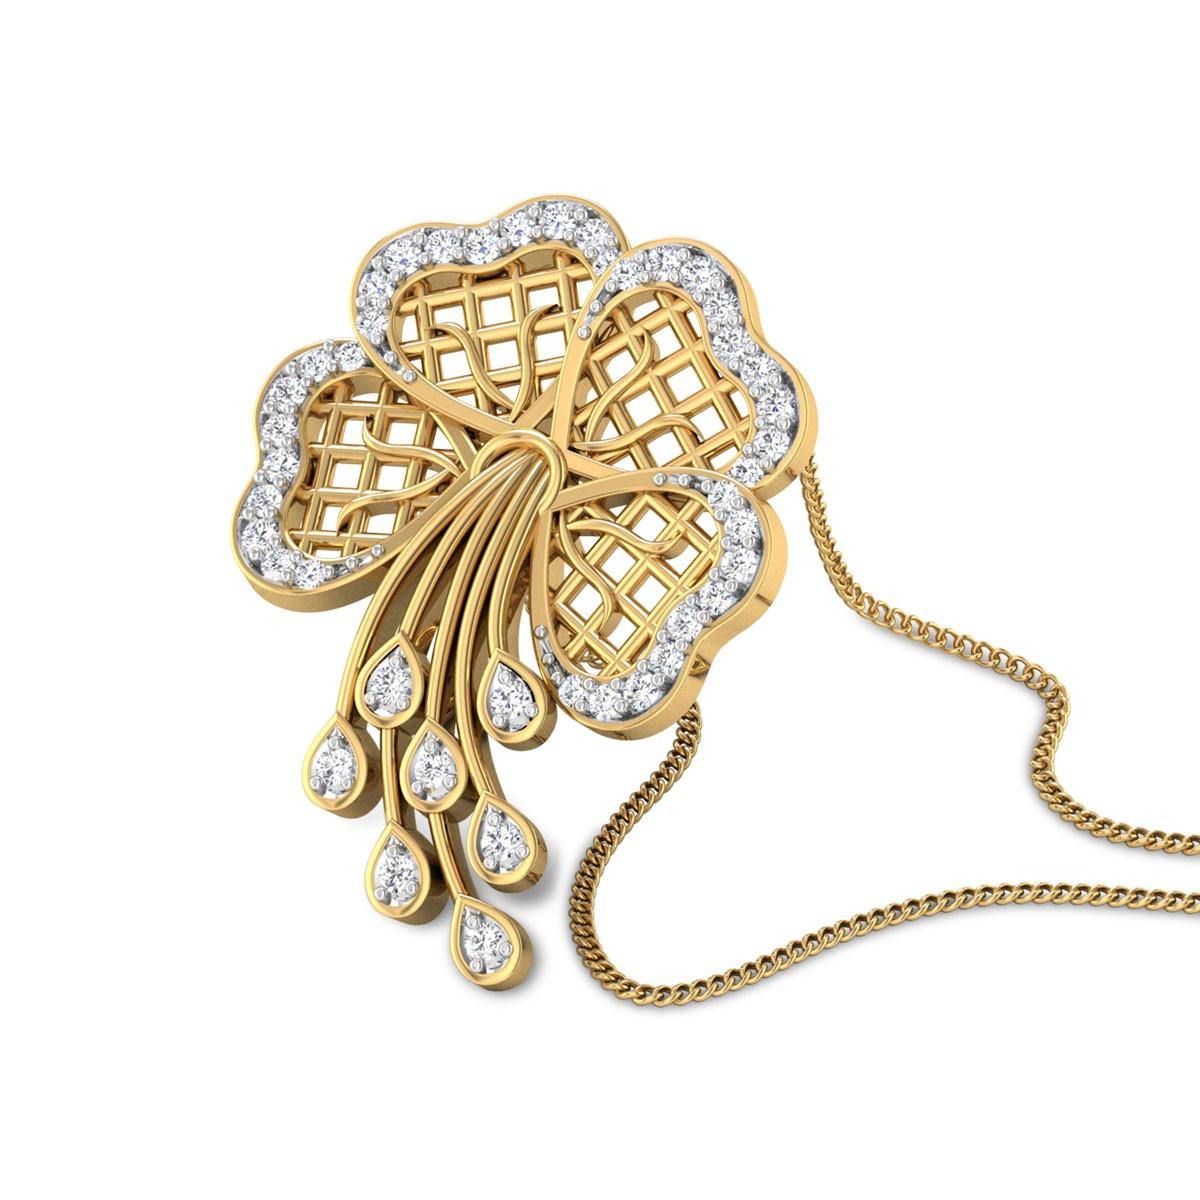 Liesel Floral Diamond Studdded Pendant